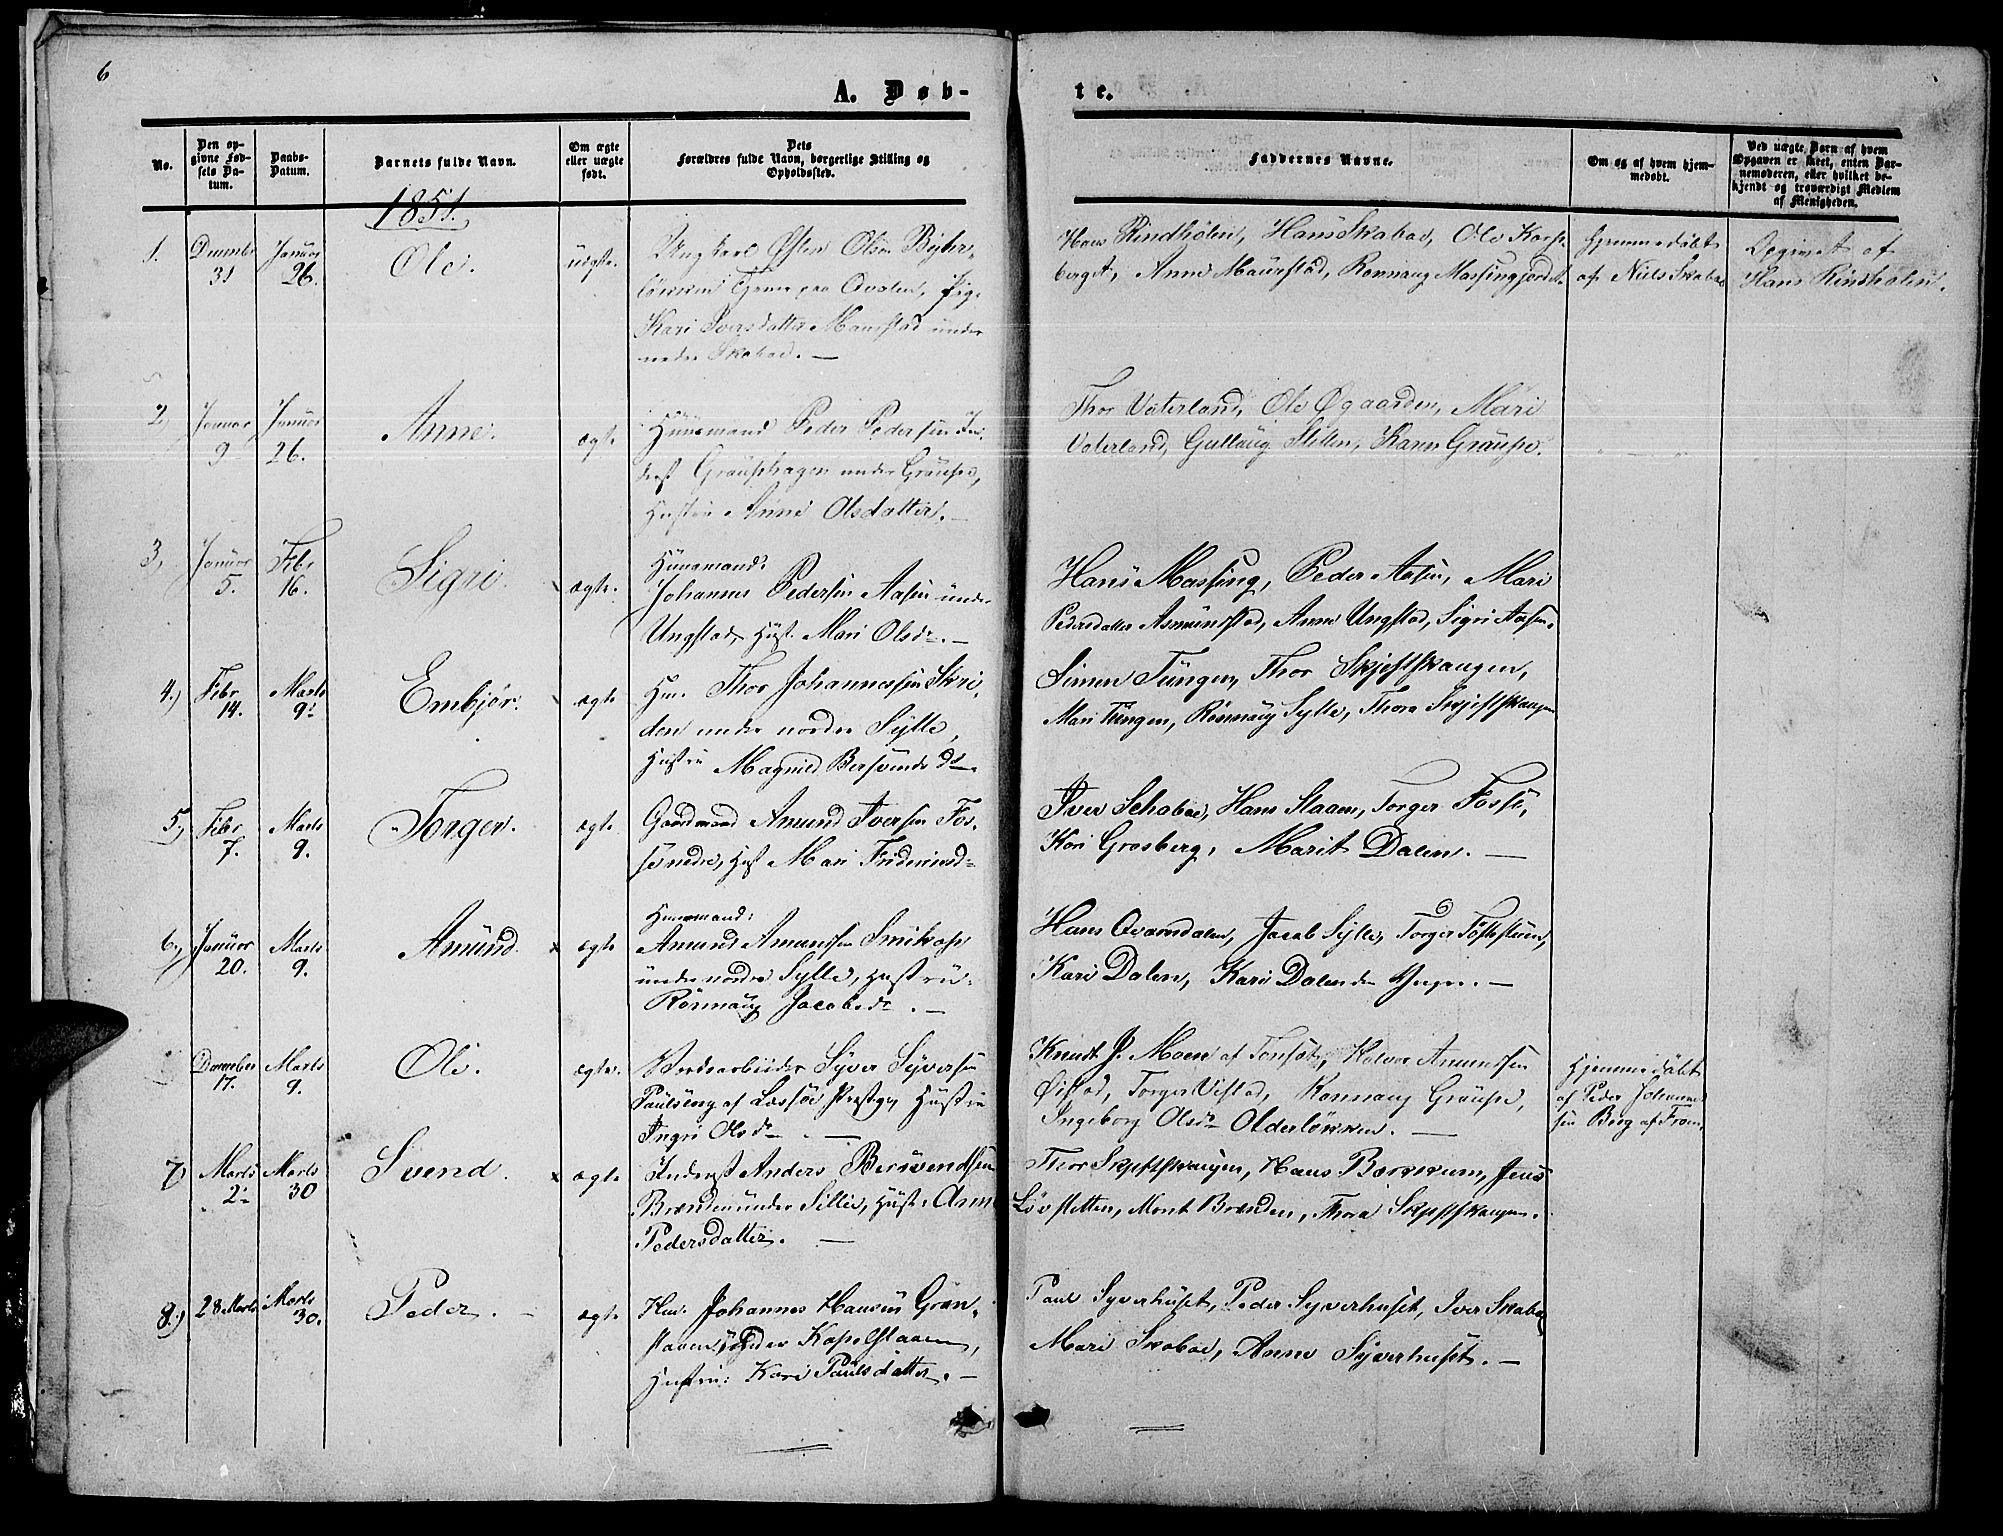 SAH, Nord-Fron prestekontor, Klokkerbok nr. 2, 1851-1883, s. 6